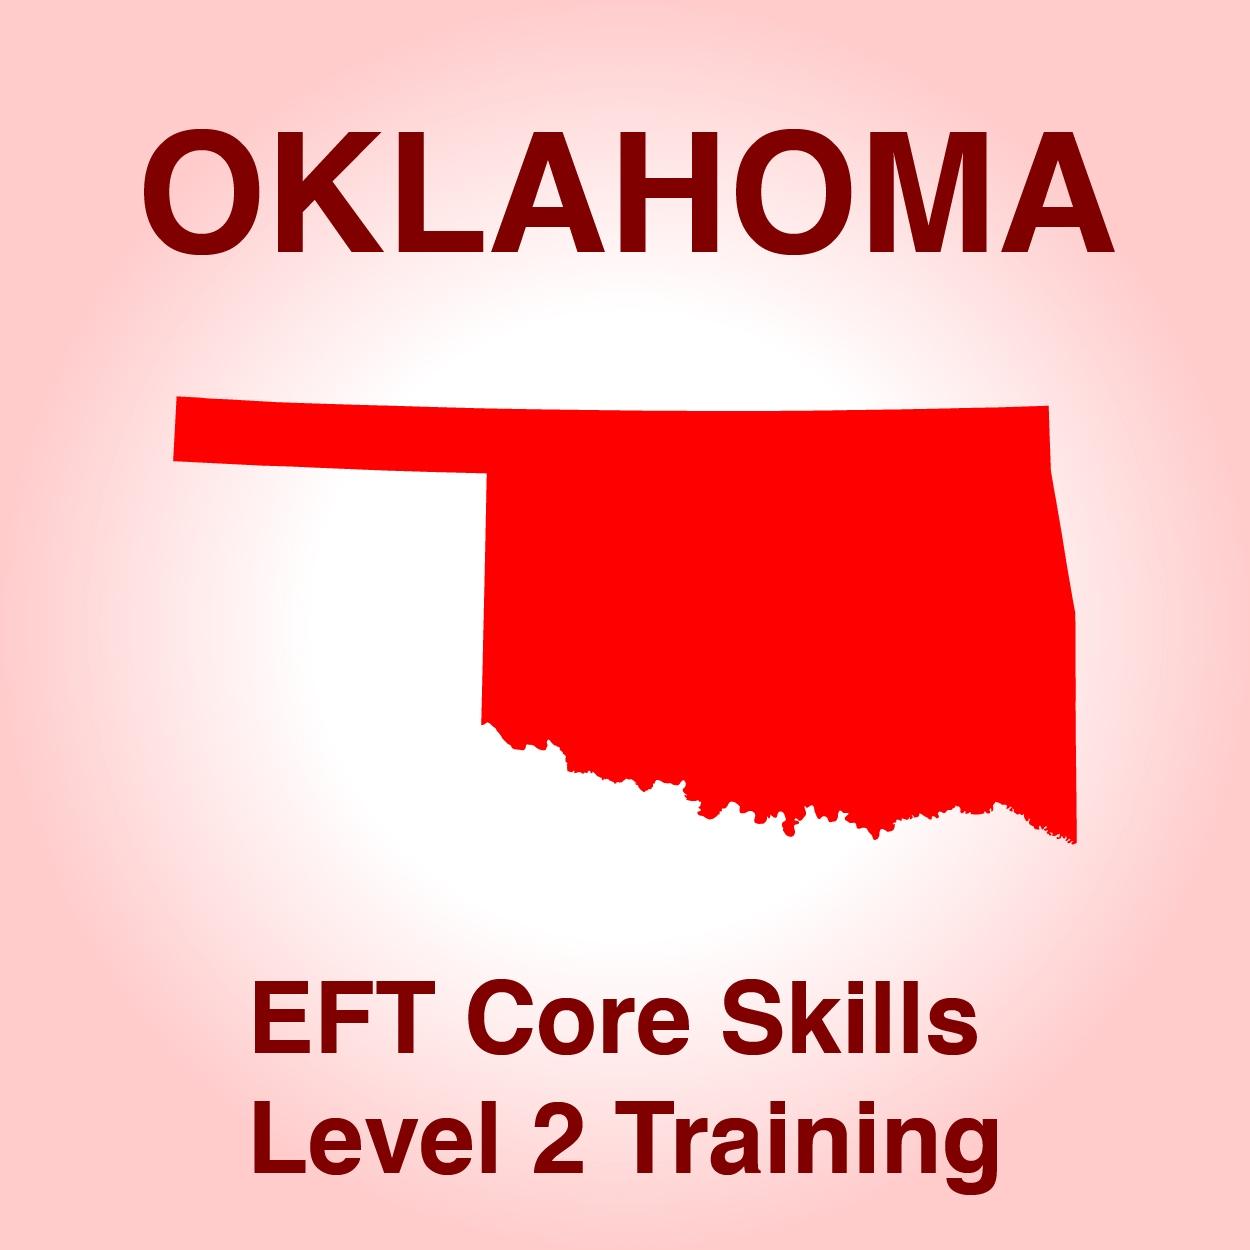 Oklahoma Eft Core Skills Starting Jan Couples